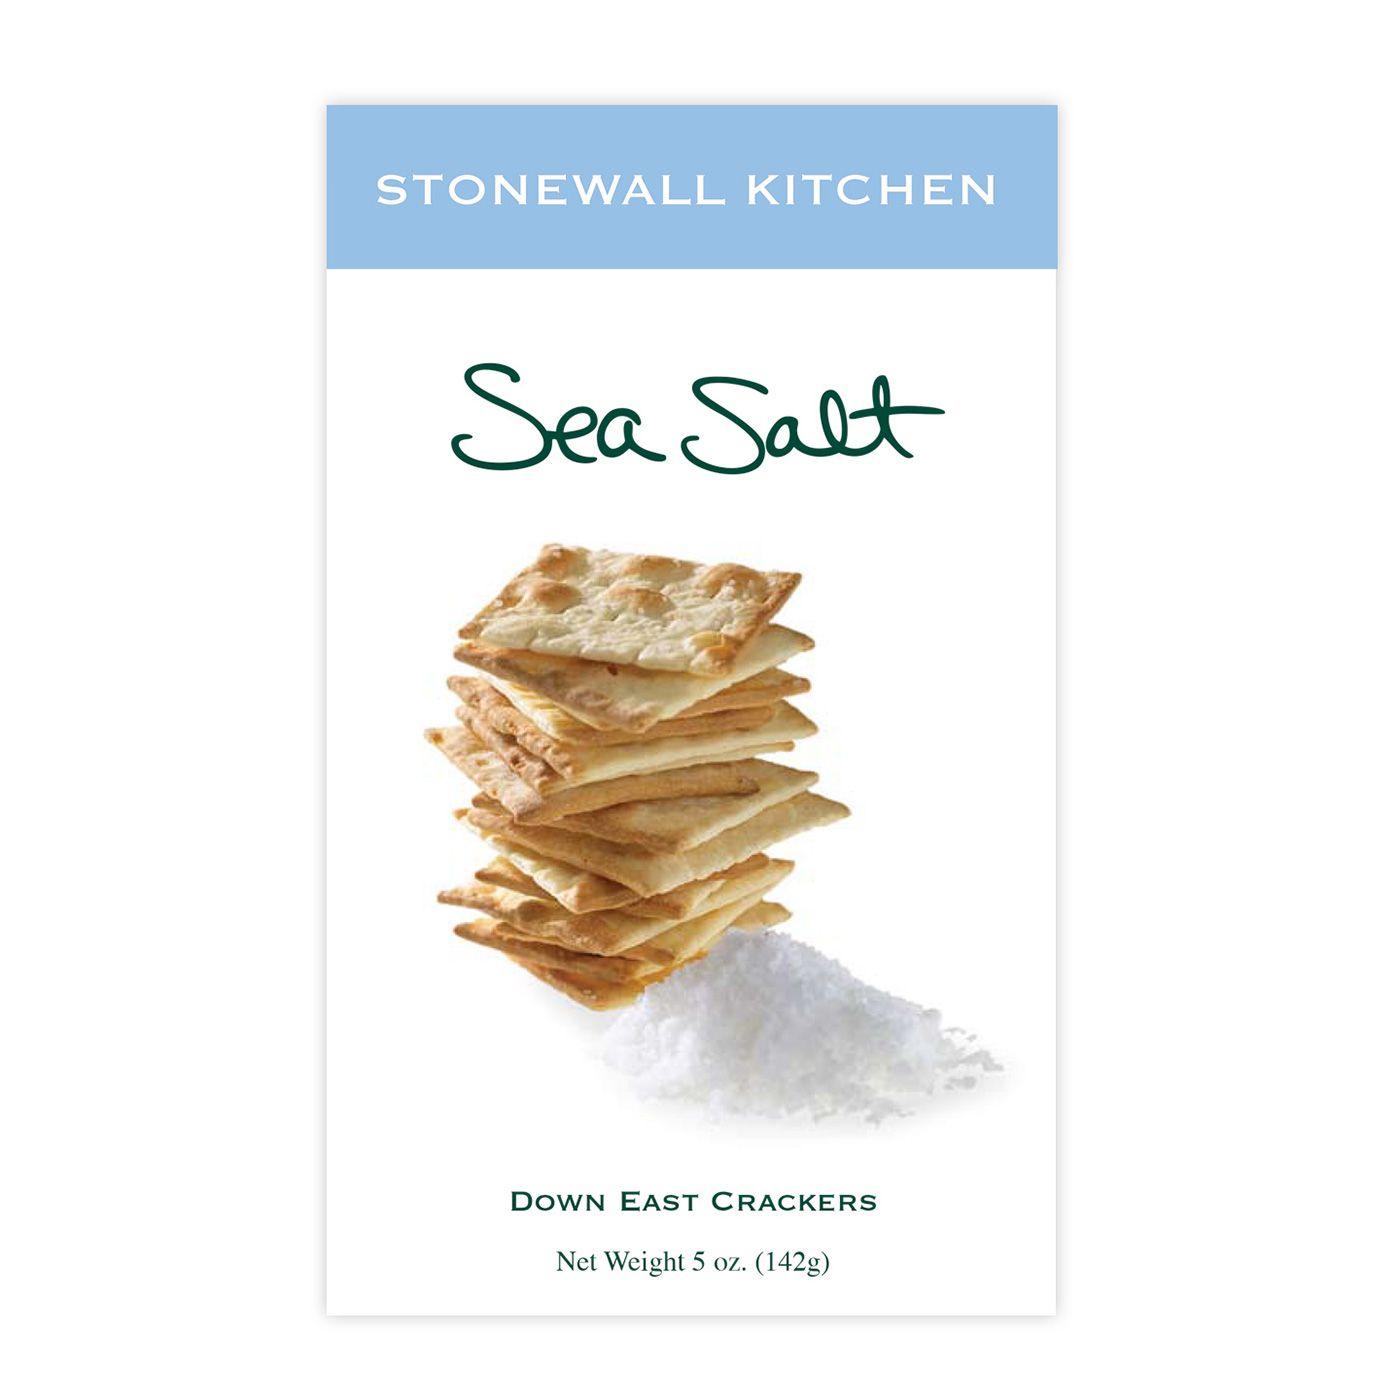 Stonewall Kitchen Sea Salt